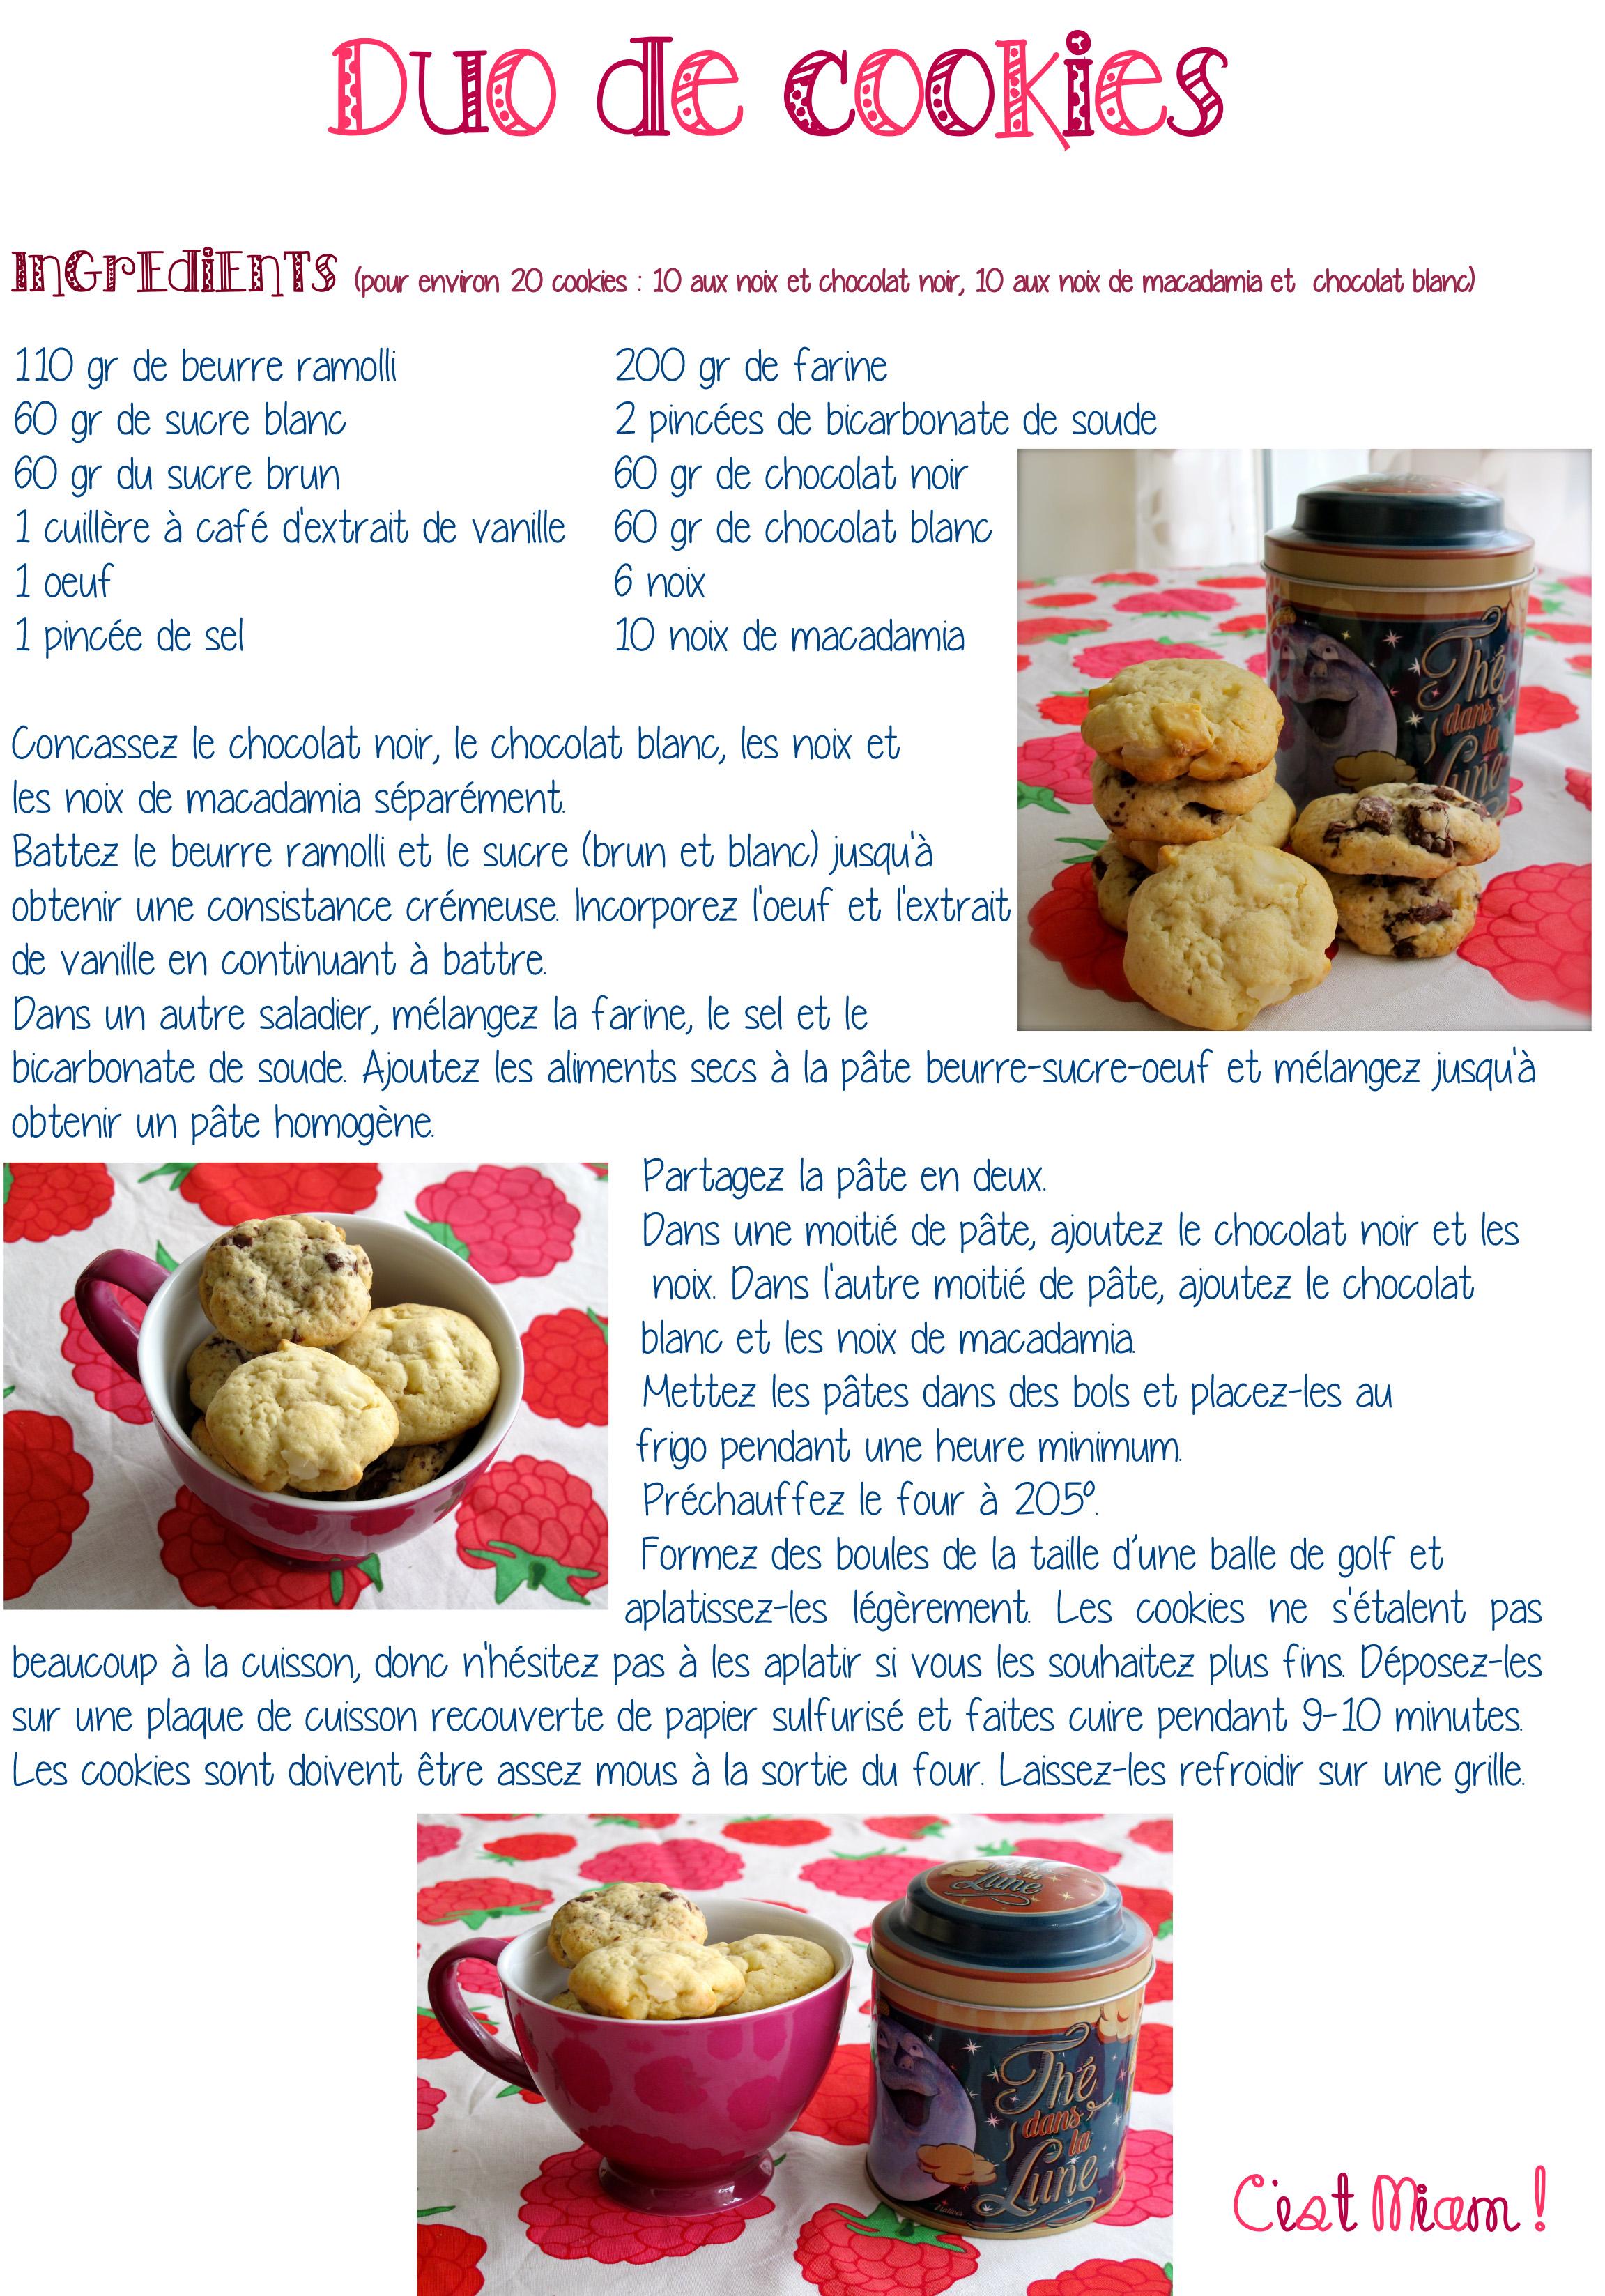 Duo de cookies - C'est Miam